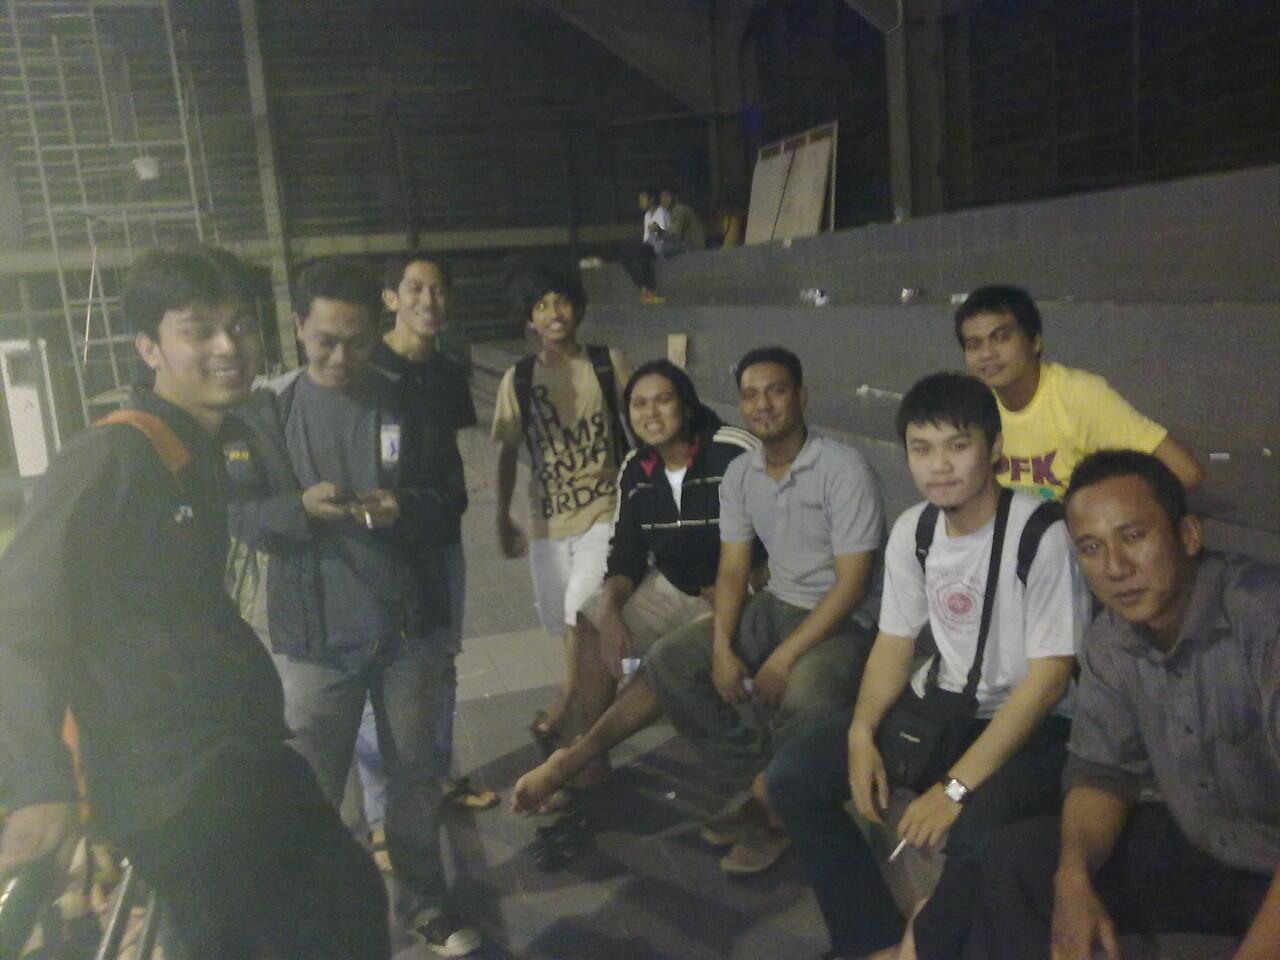 Berita Duka, Telah meninggal dunia rekan Moderator Sichilya aka Achiel